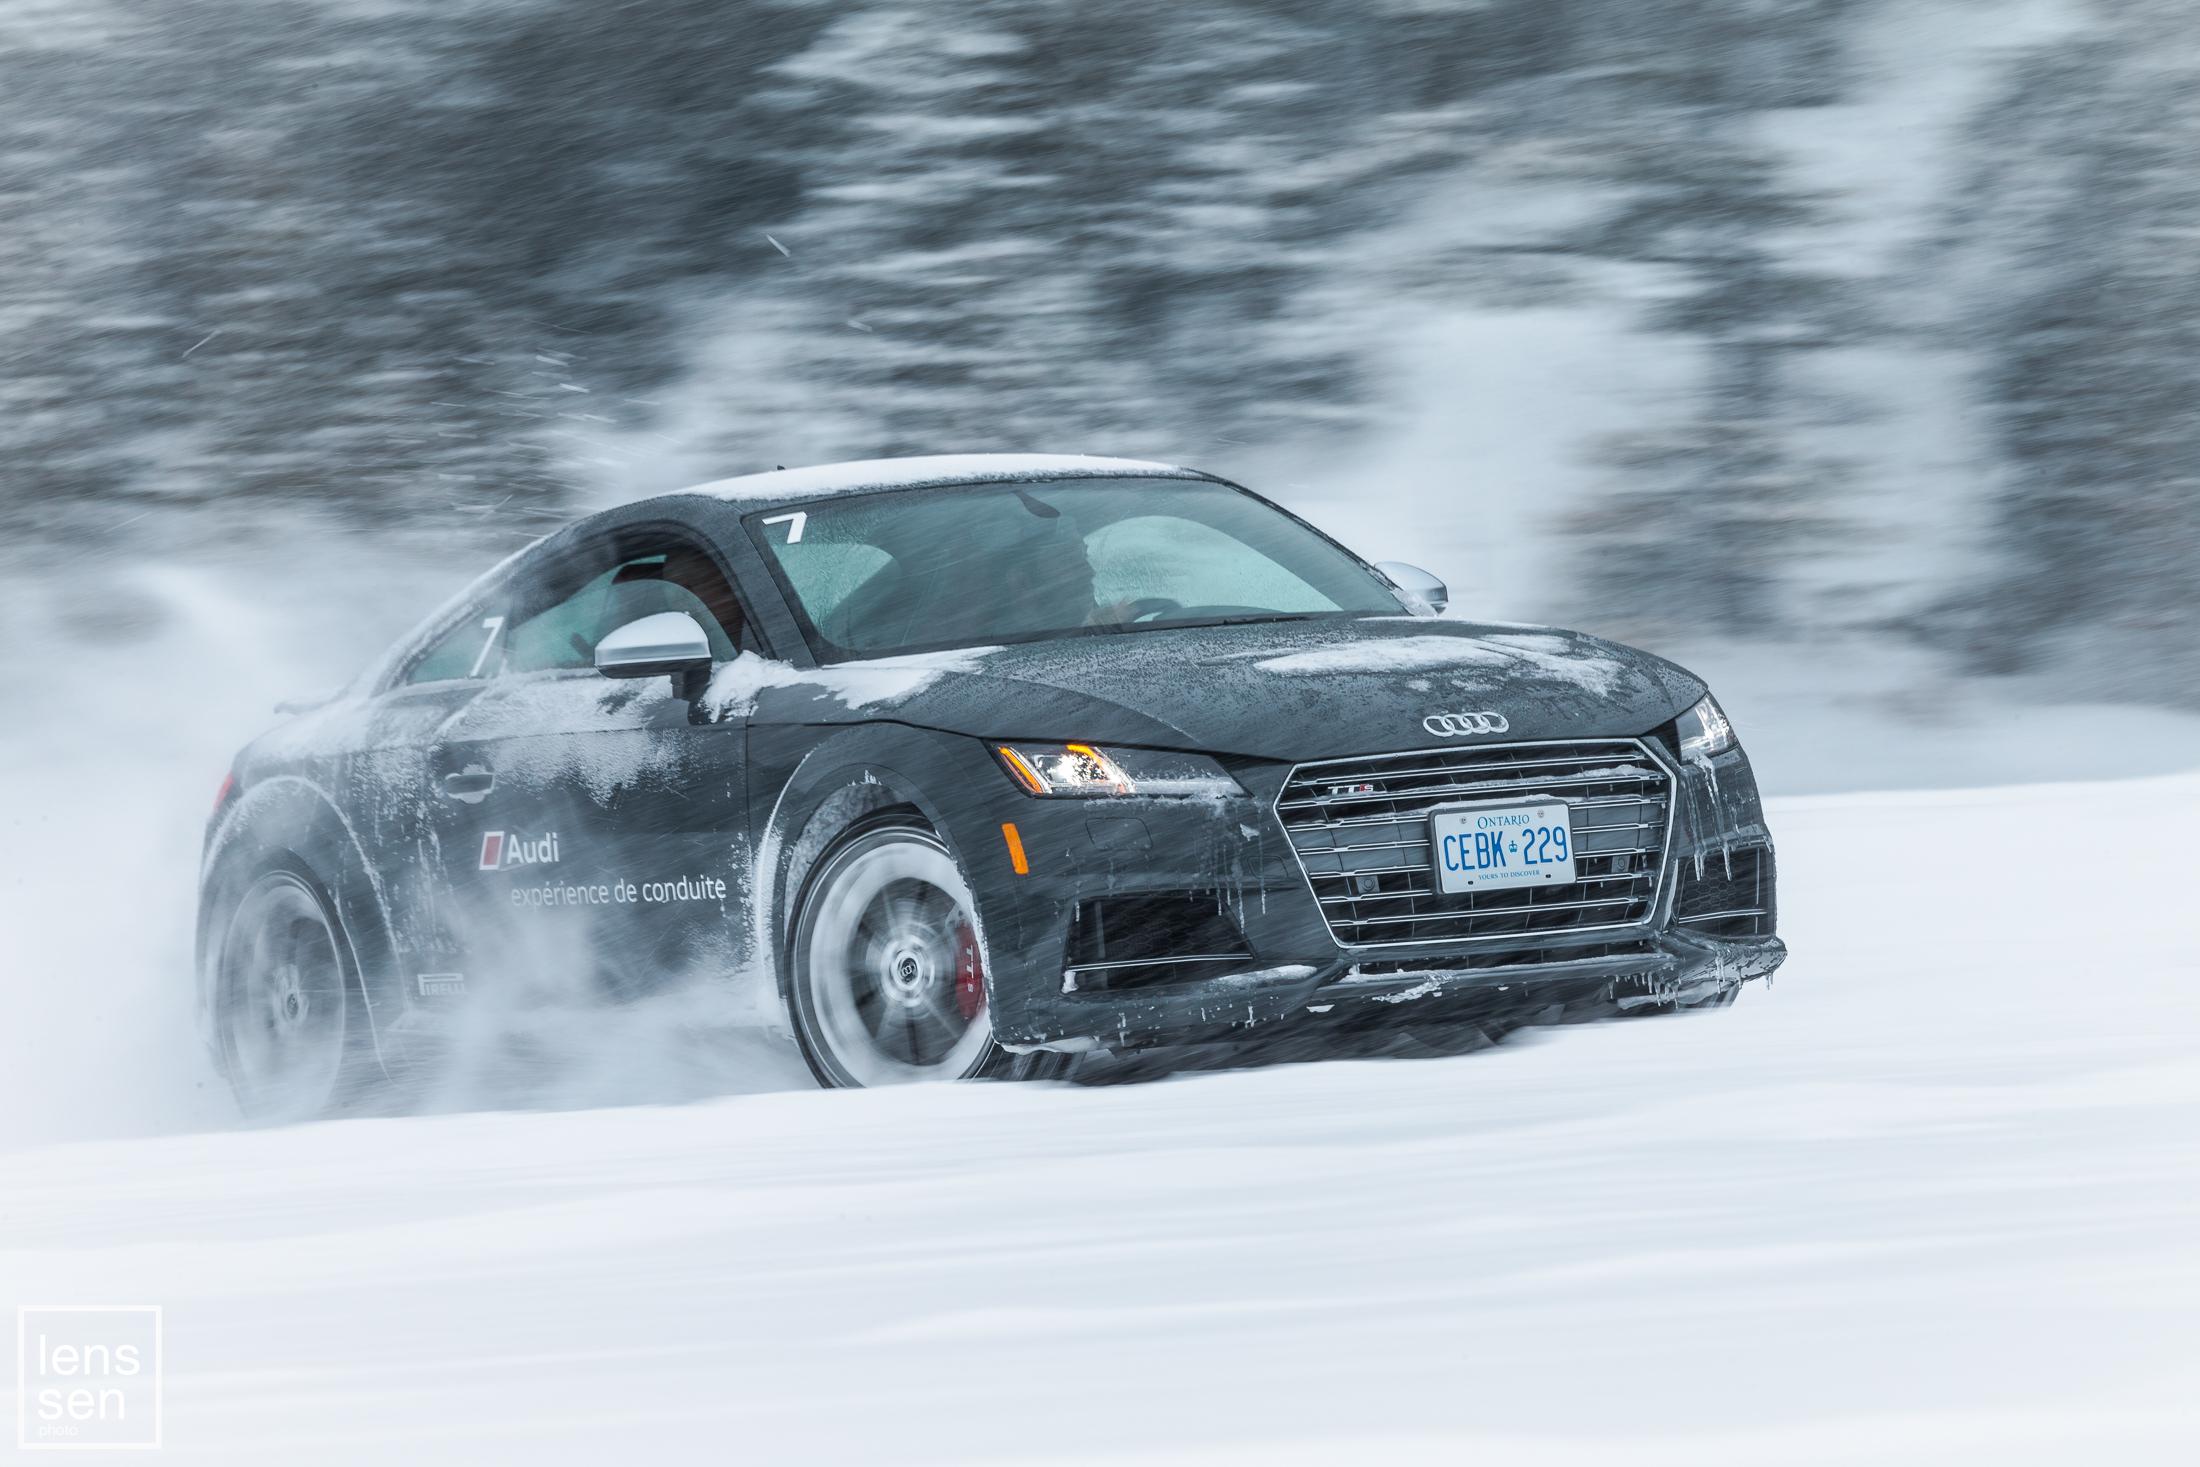 Audi Ice Experience - Sacacomie QC - Feb 2018 - 122 -3569.jpg